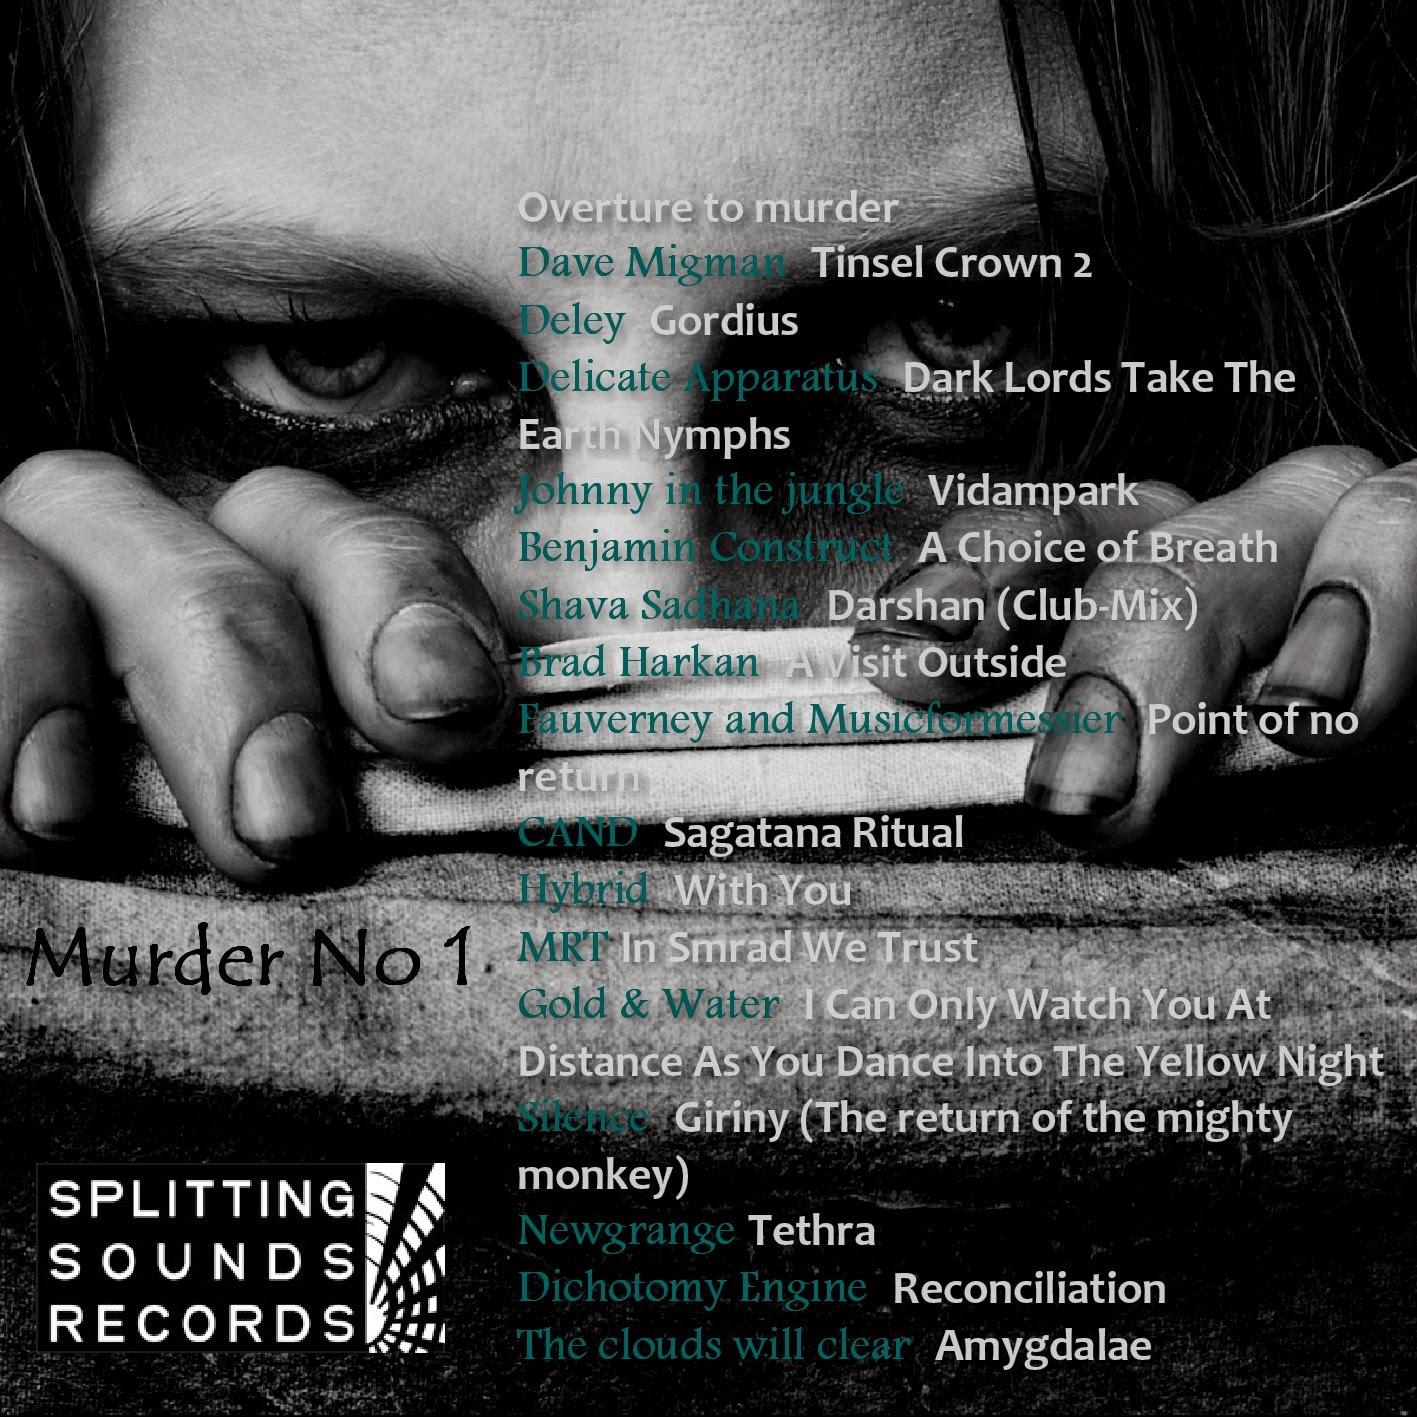 Chaosphere Vol. 2 - Sleepwalk To Murder (murder No 1)postrock noise drone ambient experimental